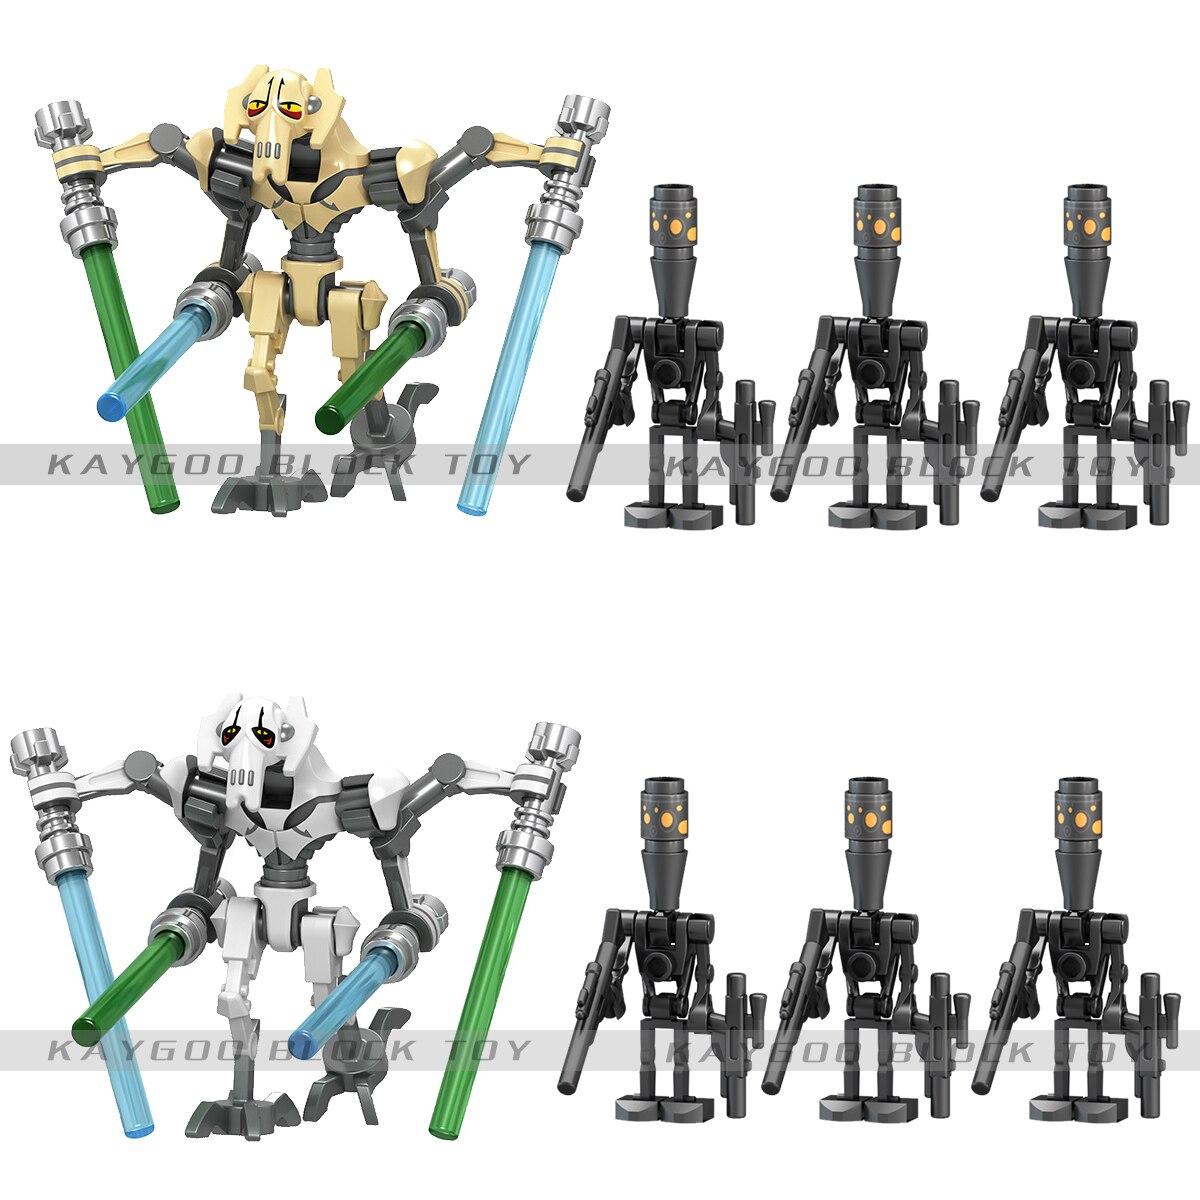 Single Sale Star Space Wars General Grievous Figures Models Building Blocks Brick Model Set Toys For Children Chrismas Gift